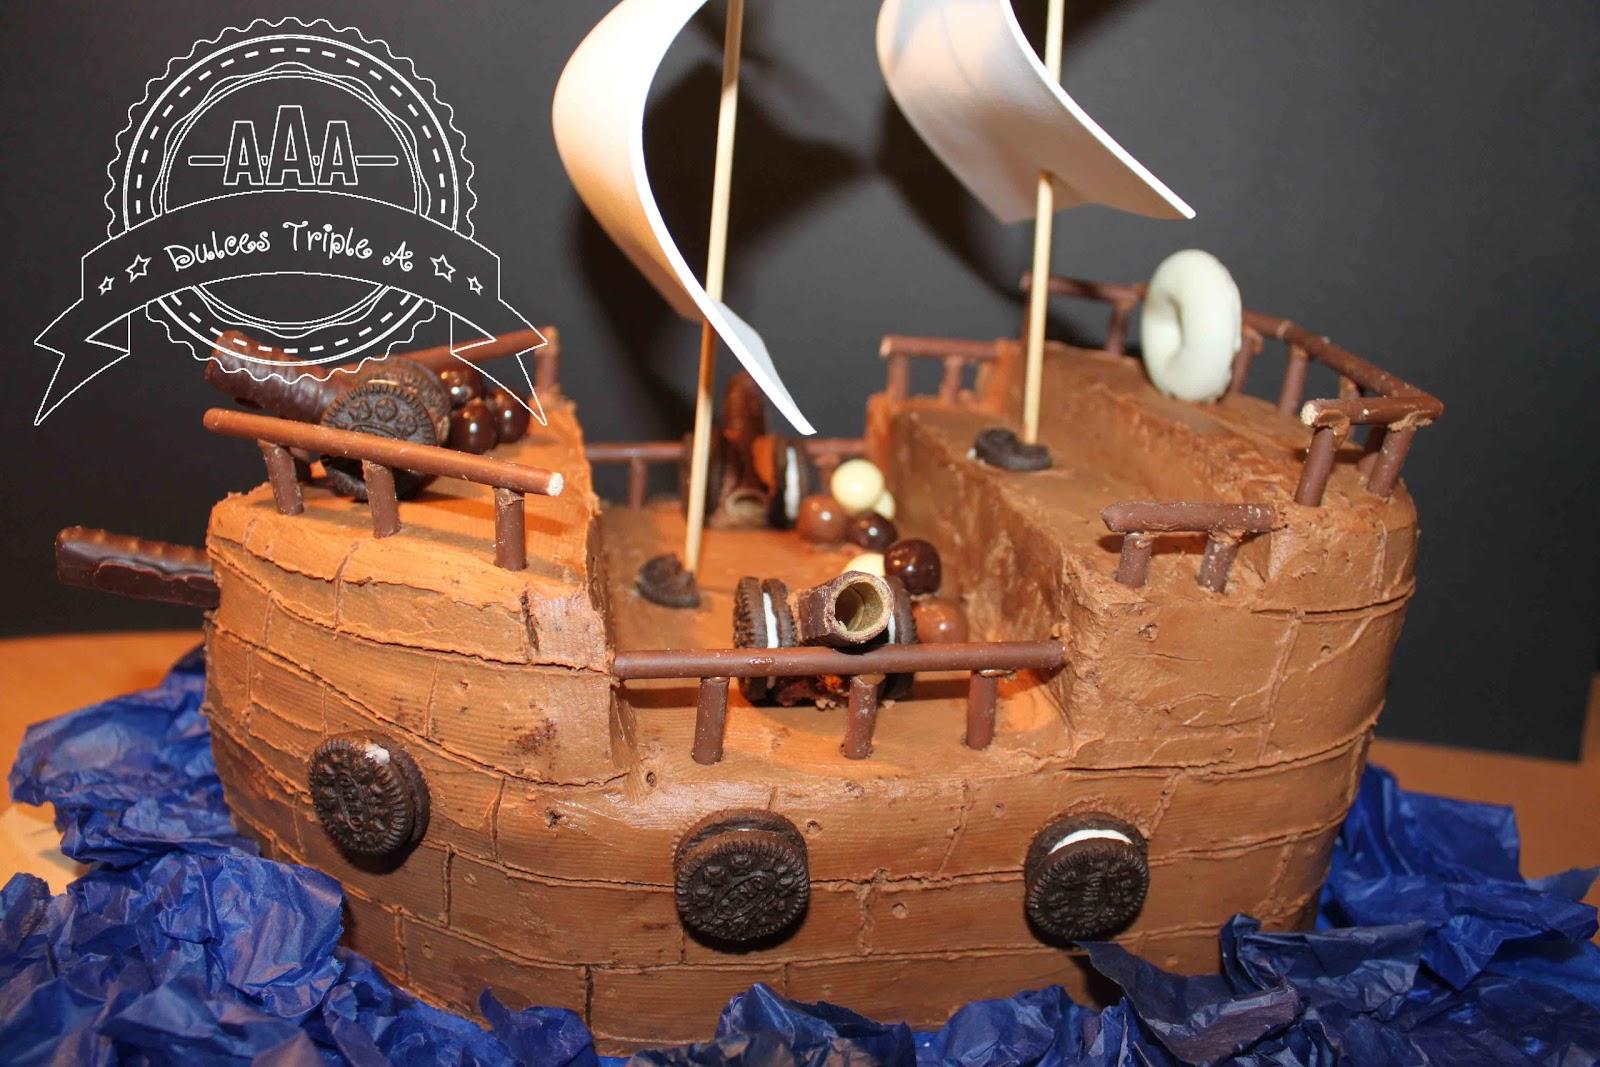 Tarta Barco Pirata. Para el Príncipe de mi Casa | DULCES TRIPLE A